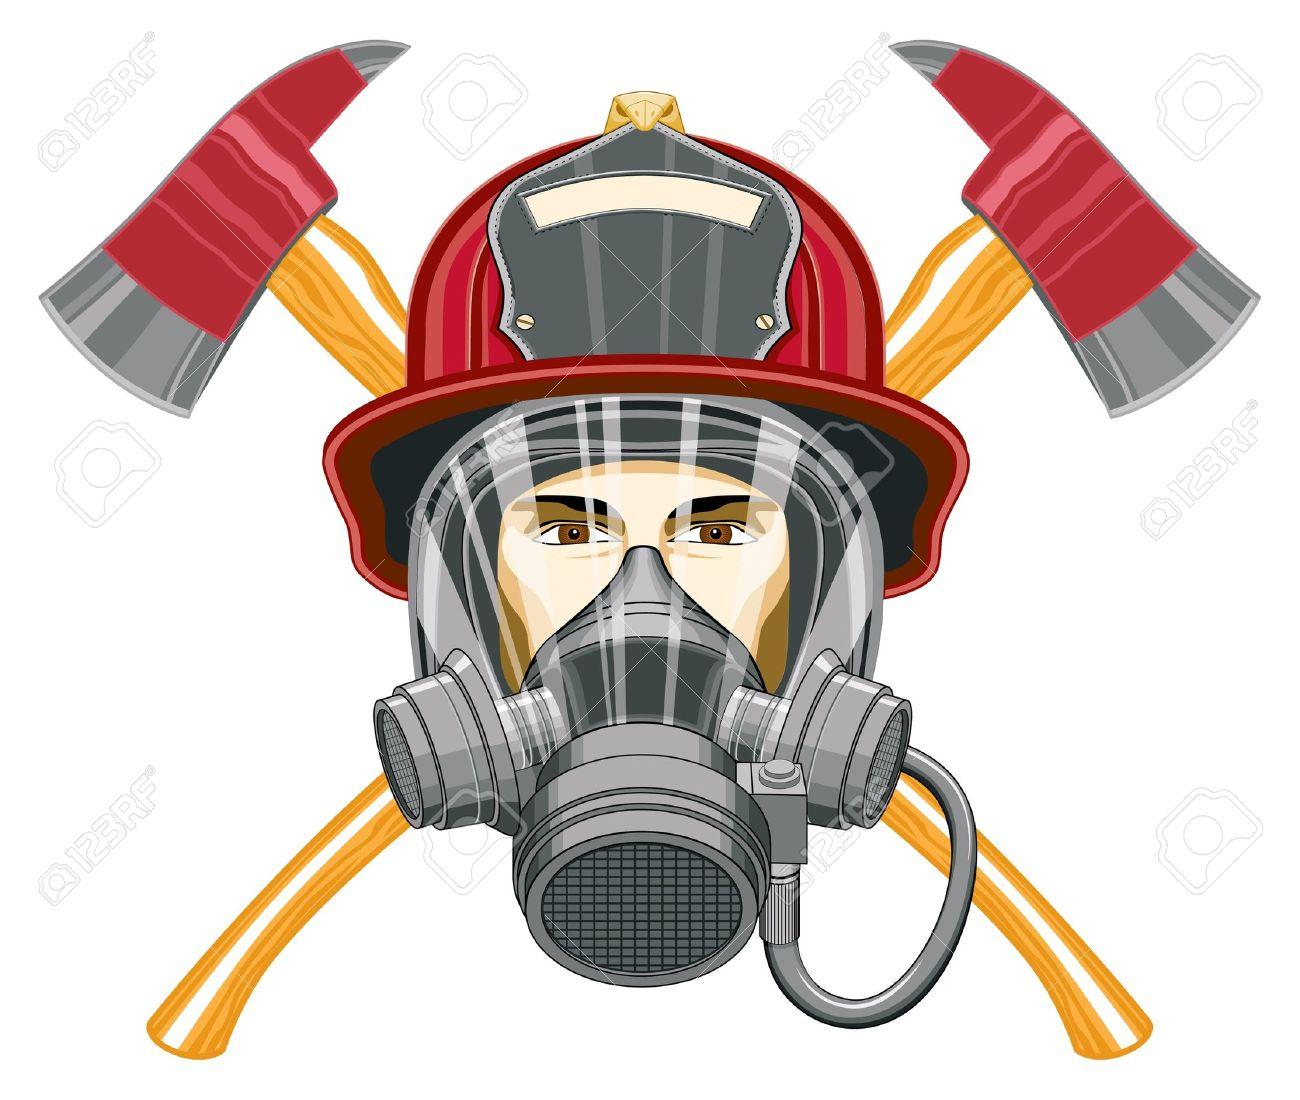 1300x1100 Firefighter Helmet Drawing